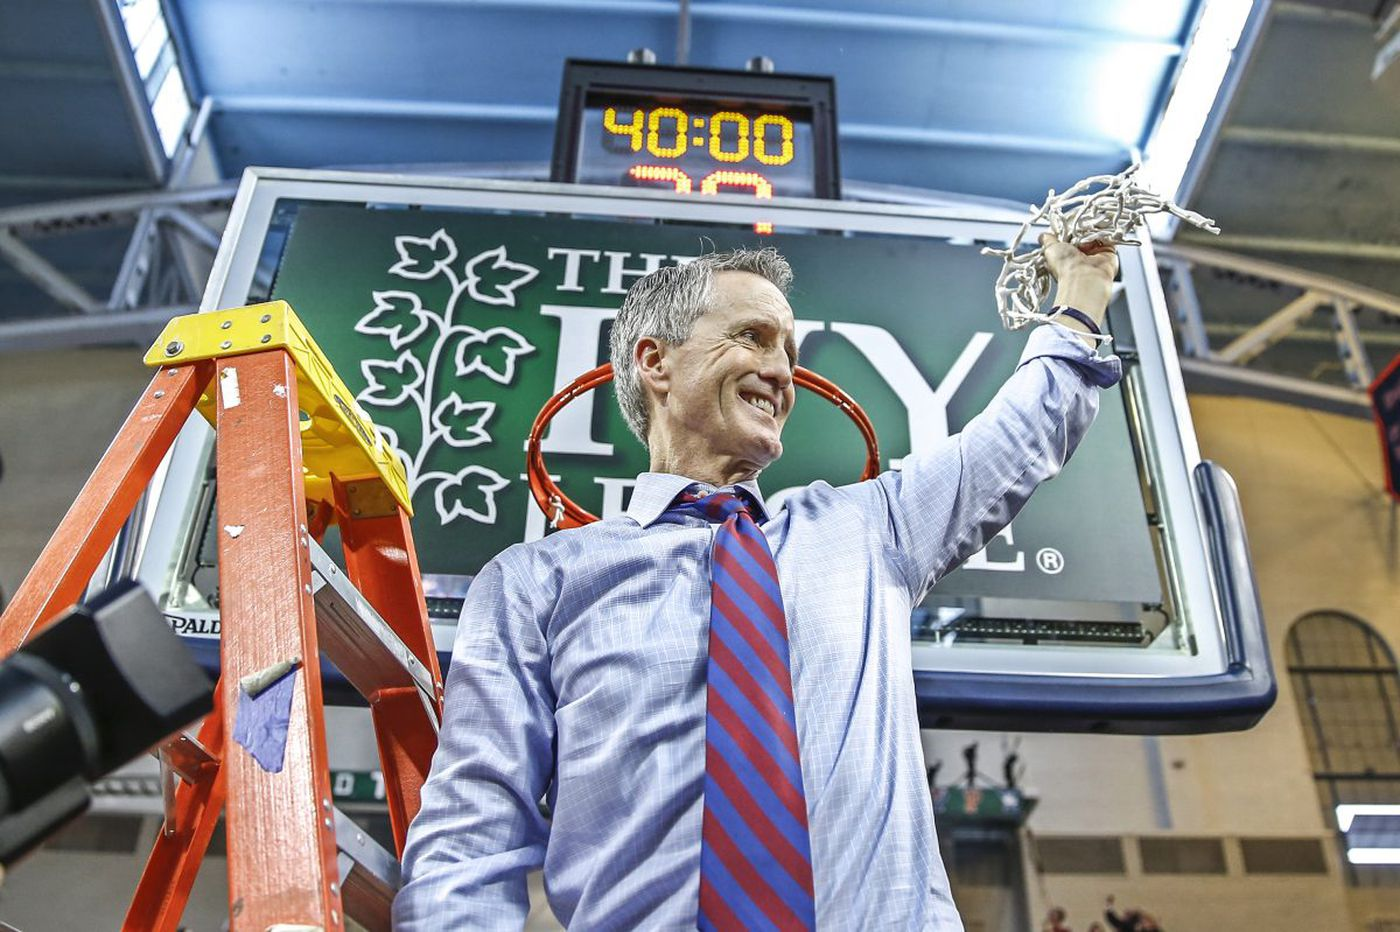 Penn coach Steve Donahue believes struggles paved his NCAA path